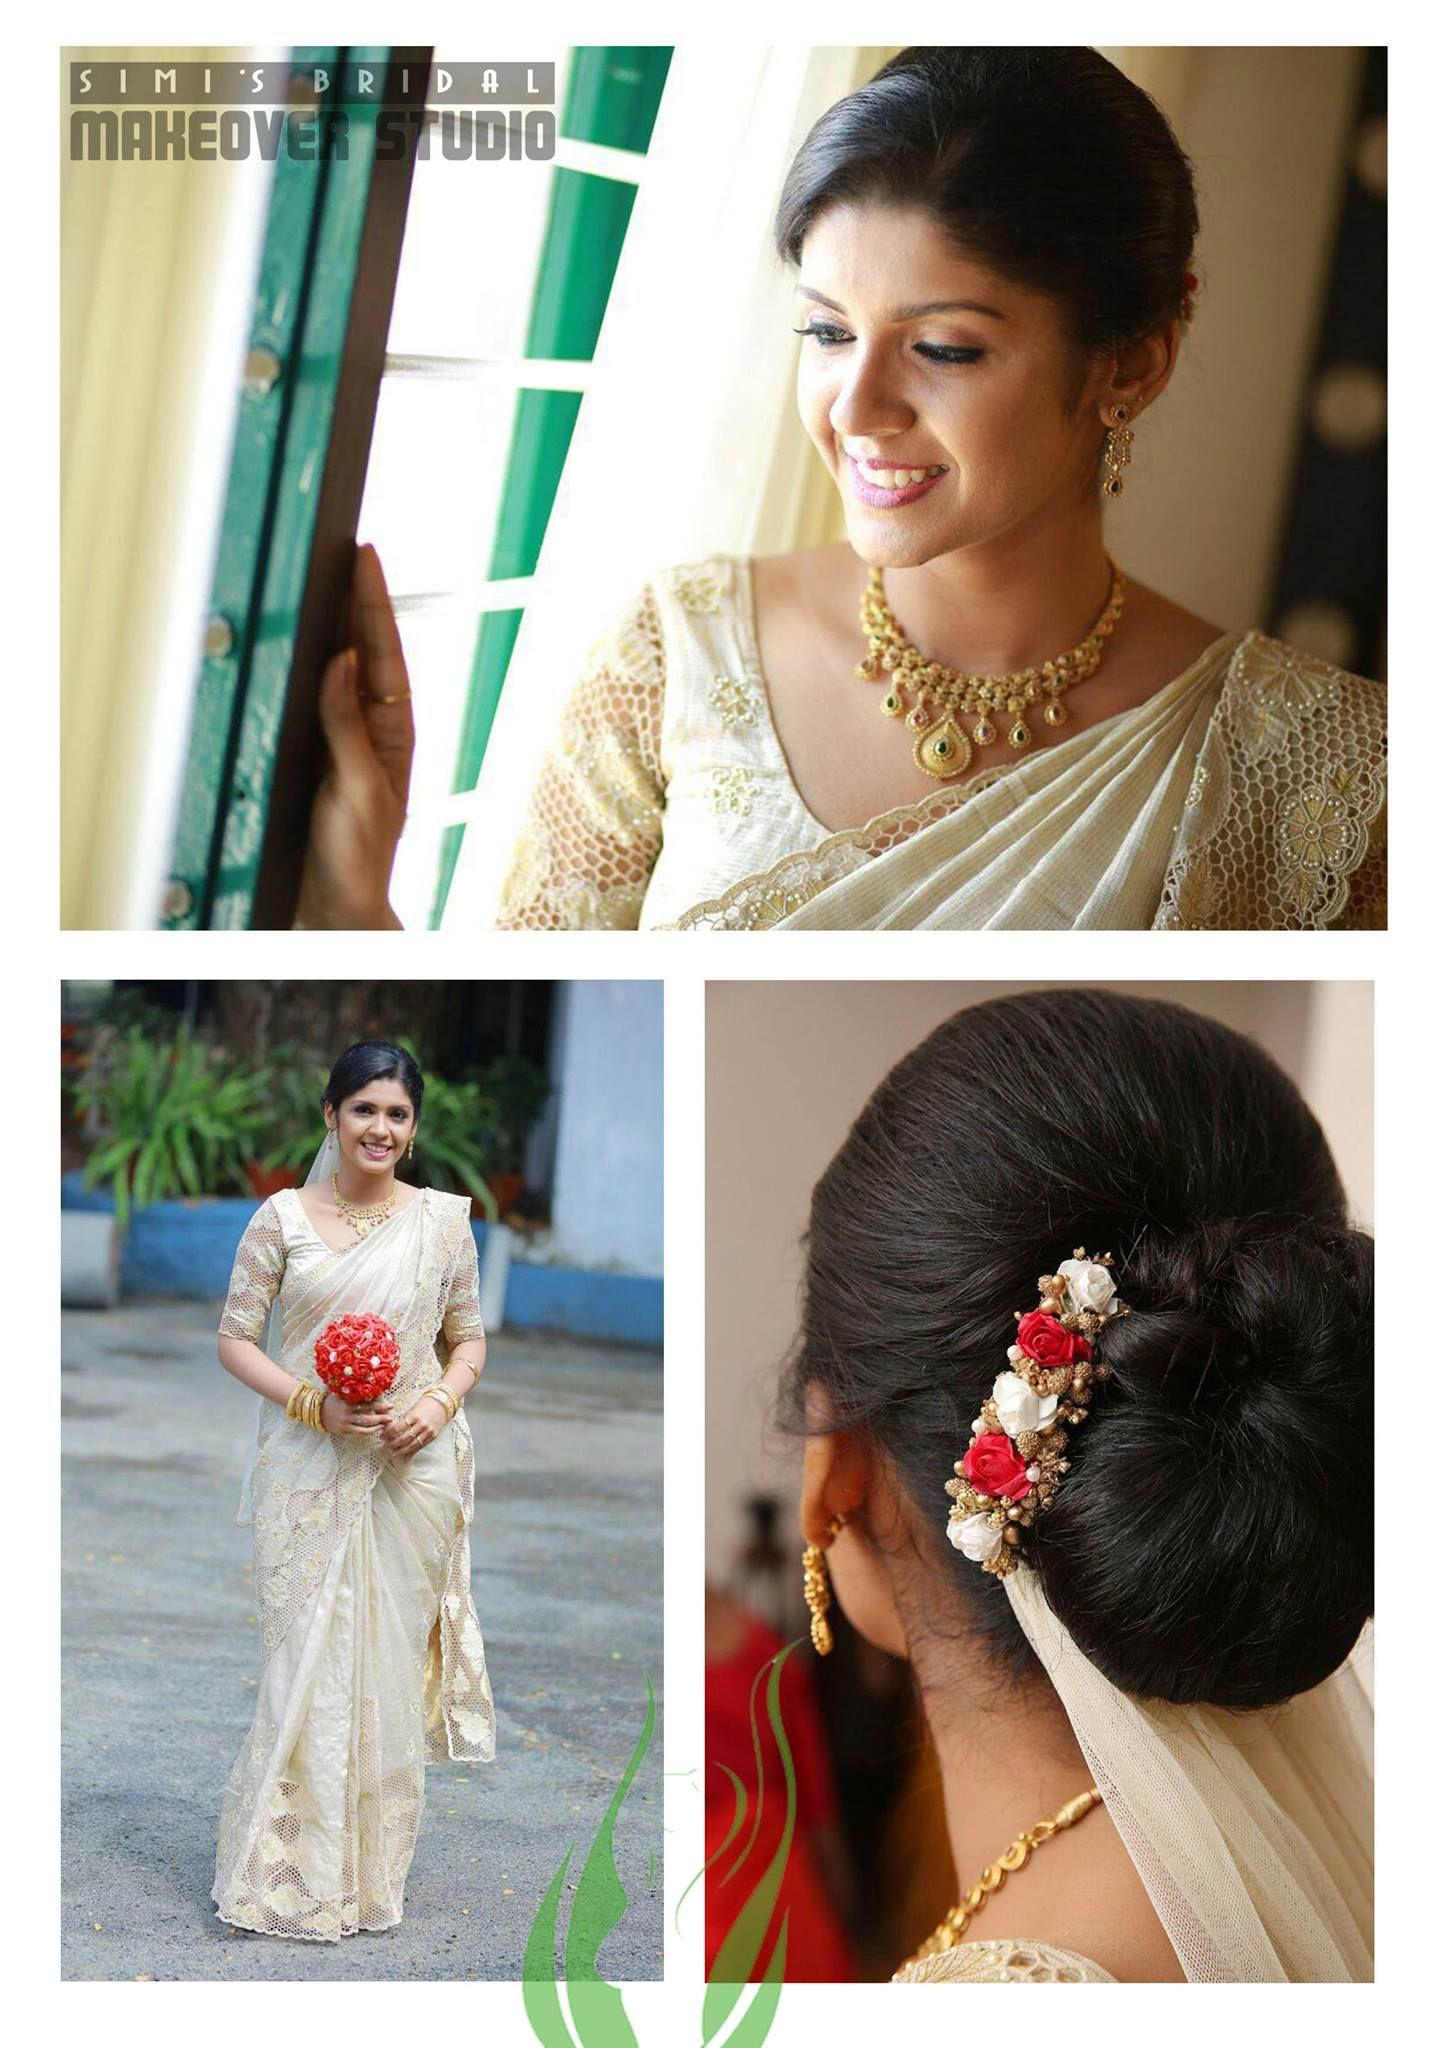 #Best Kerala Wedding/Bridal Makeup Artist #Simi'sbridalmakeupartist #simi'smakeupartist ...